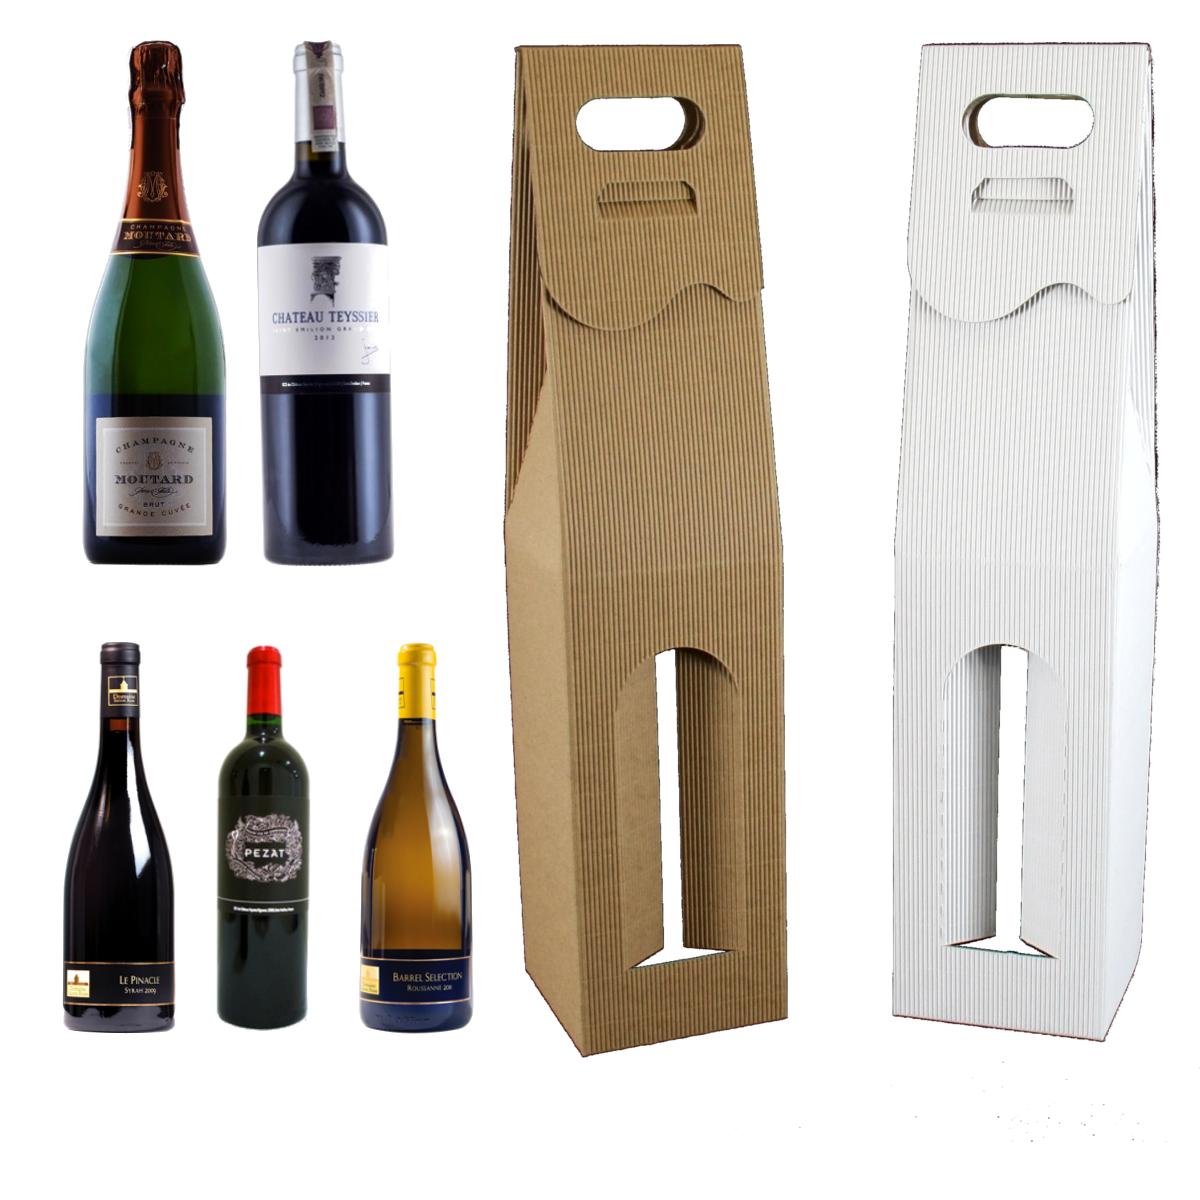 pudełka na wino białe,szare